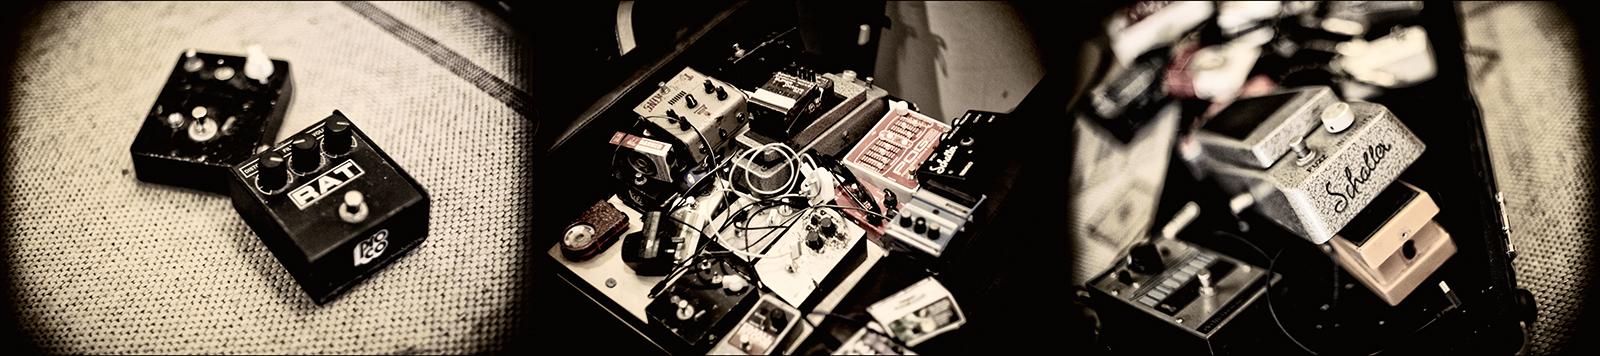 pedal copy.jpg